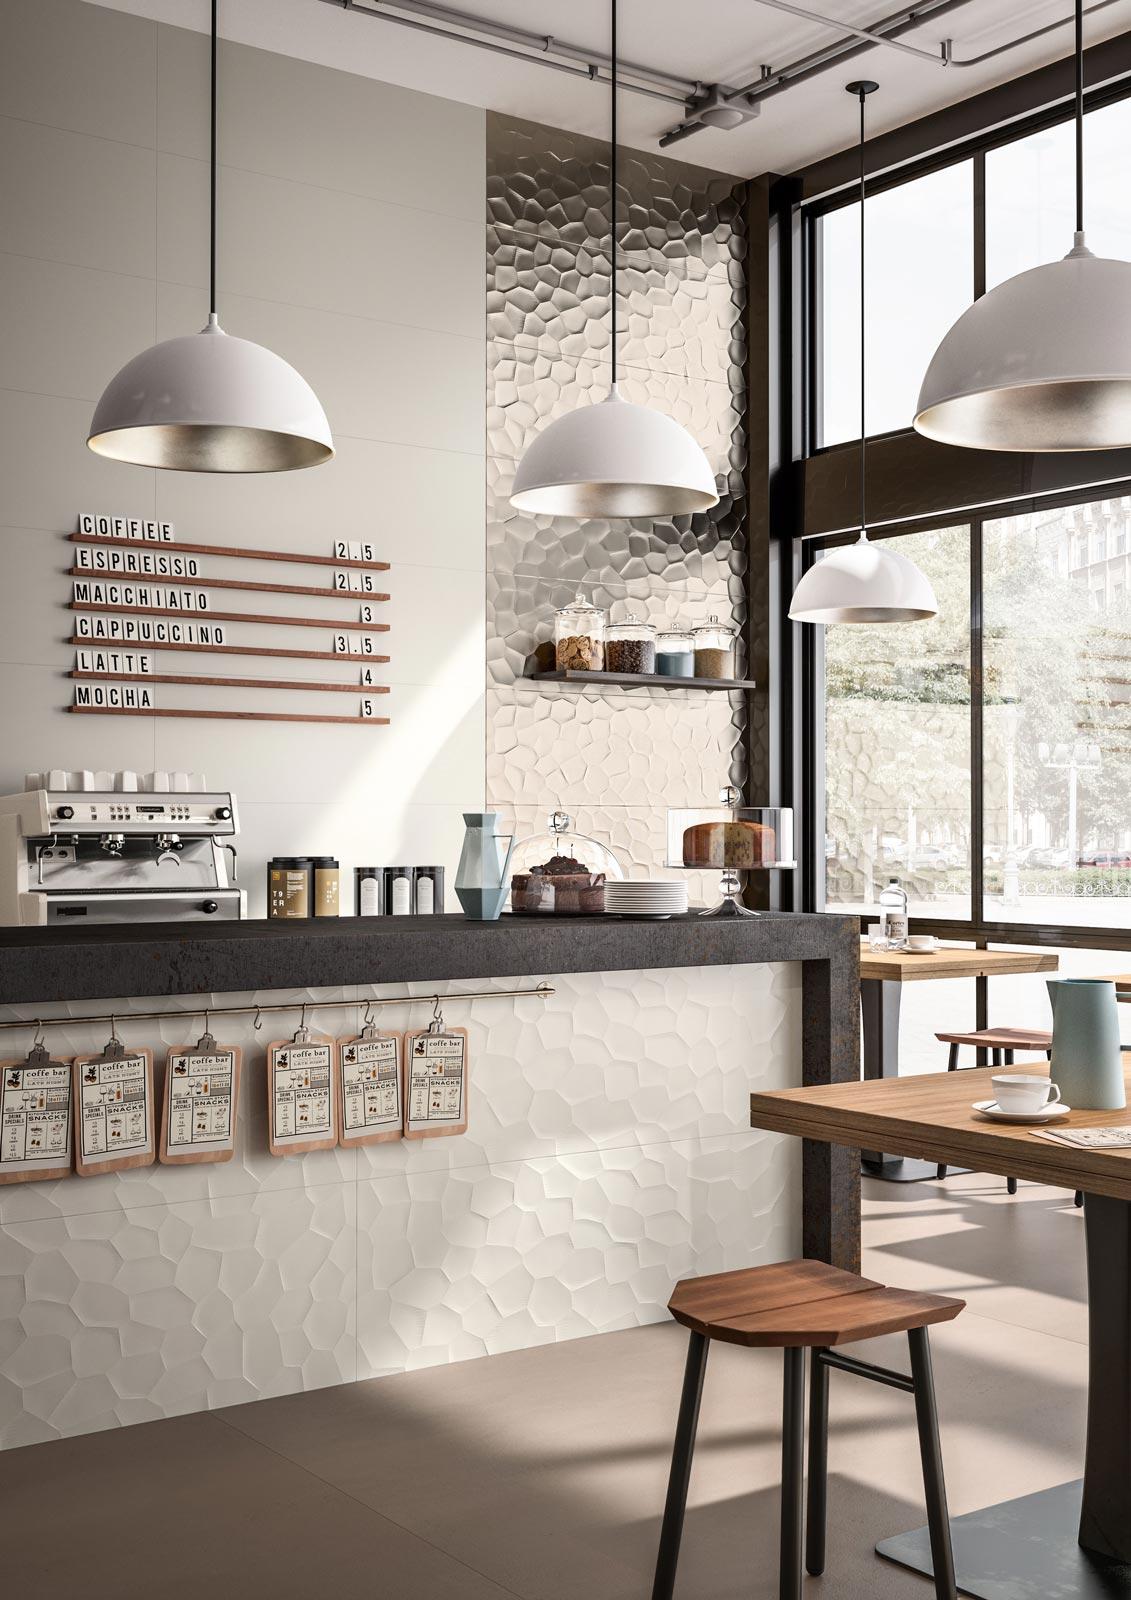 Emejing Rivestimenti Cucina Marazzi Images - Design & Ideas 2017 ...